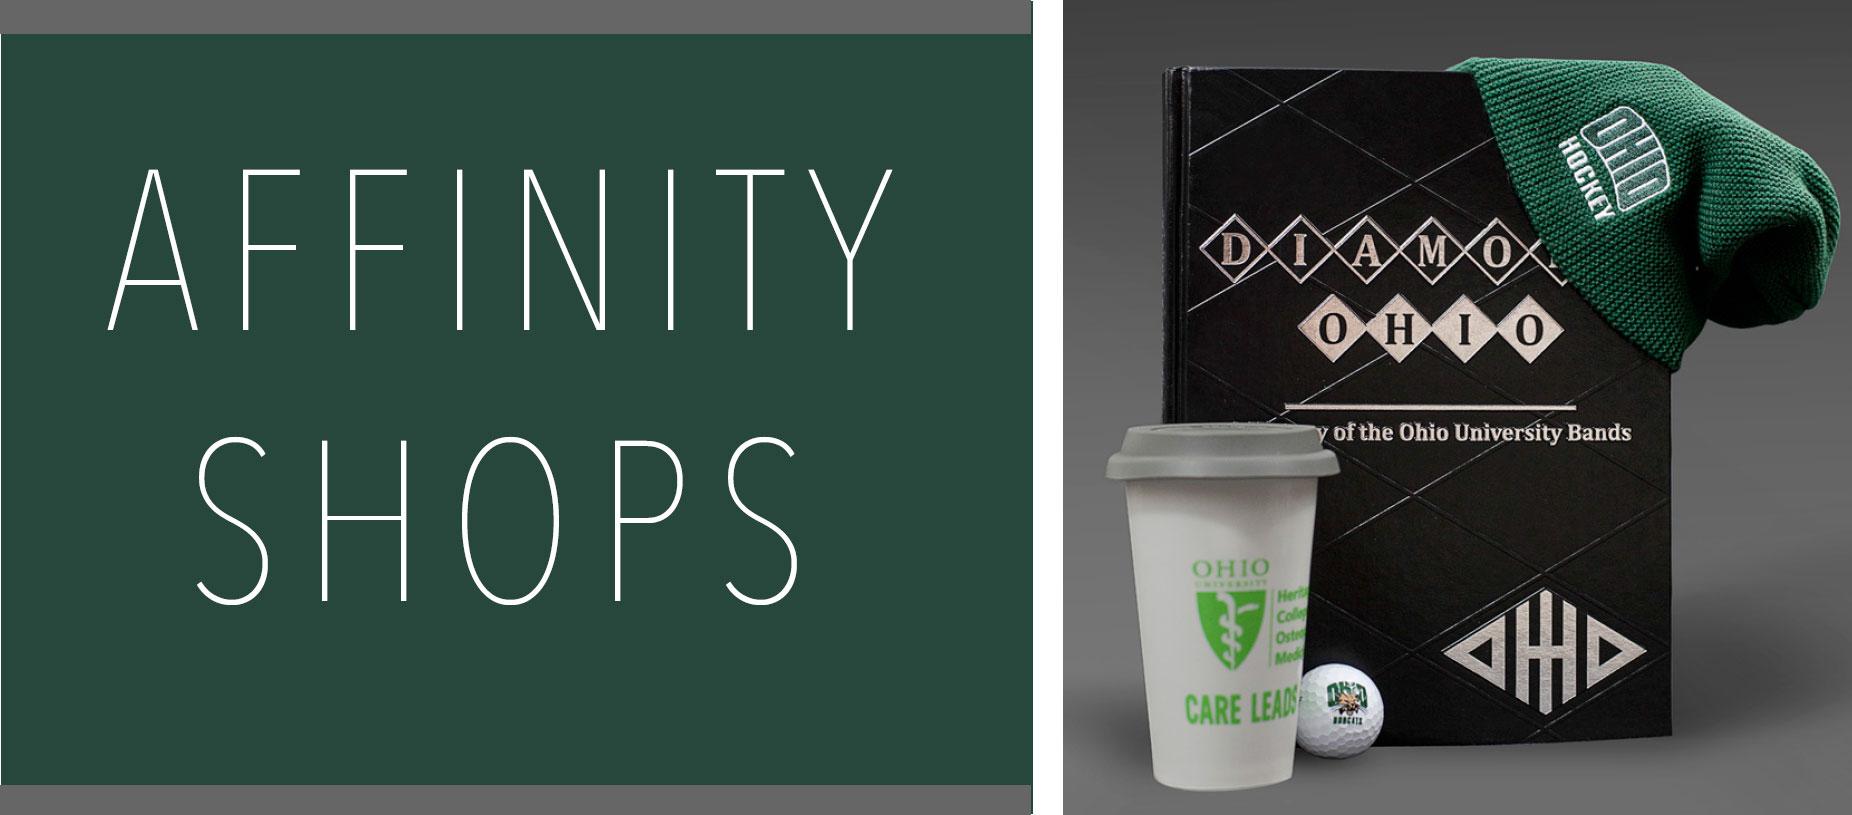 Affinity Shops